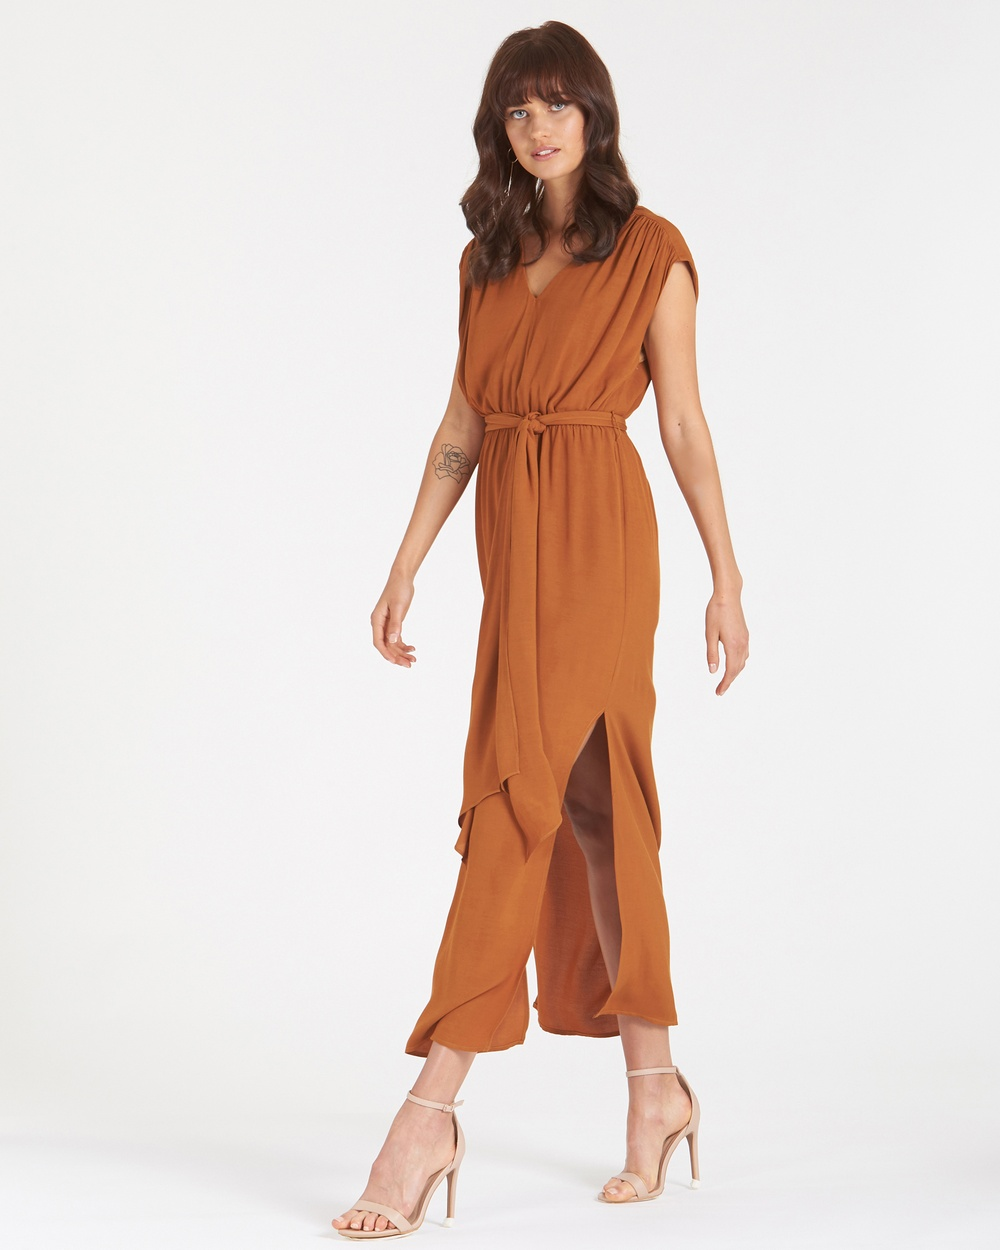 Amelius Adena Dress Dresses Rust Adena Dress